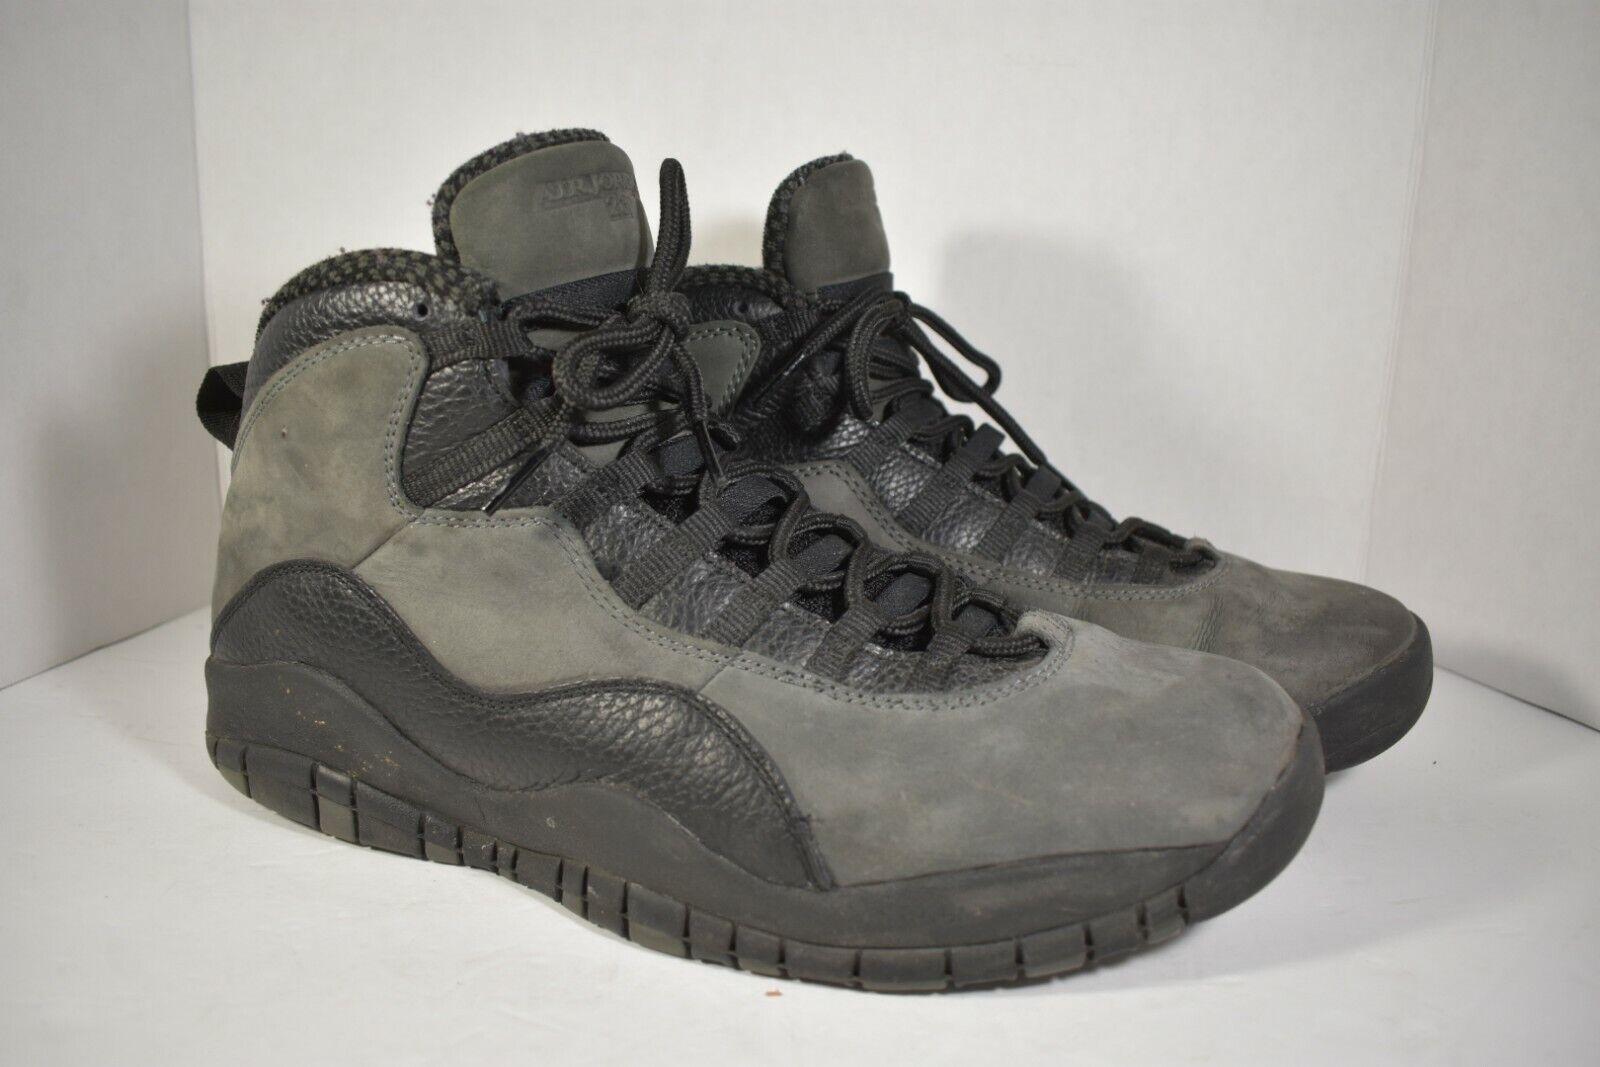 Nike Air Max Invigor Mid Black Running Shoes Boot NWT